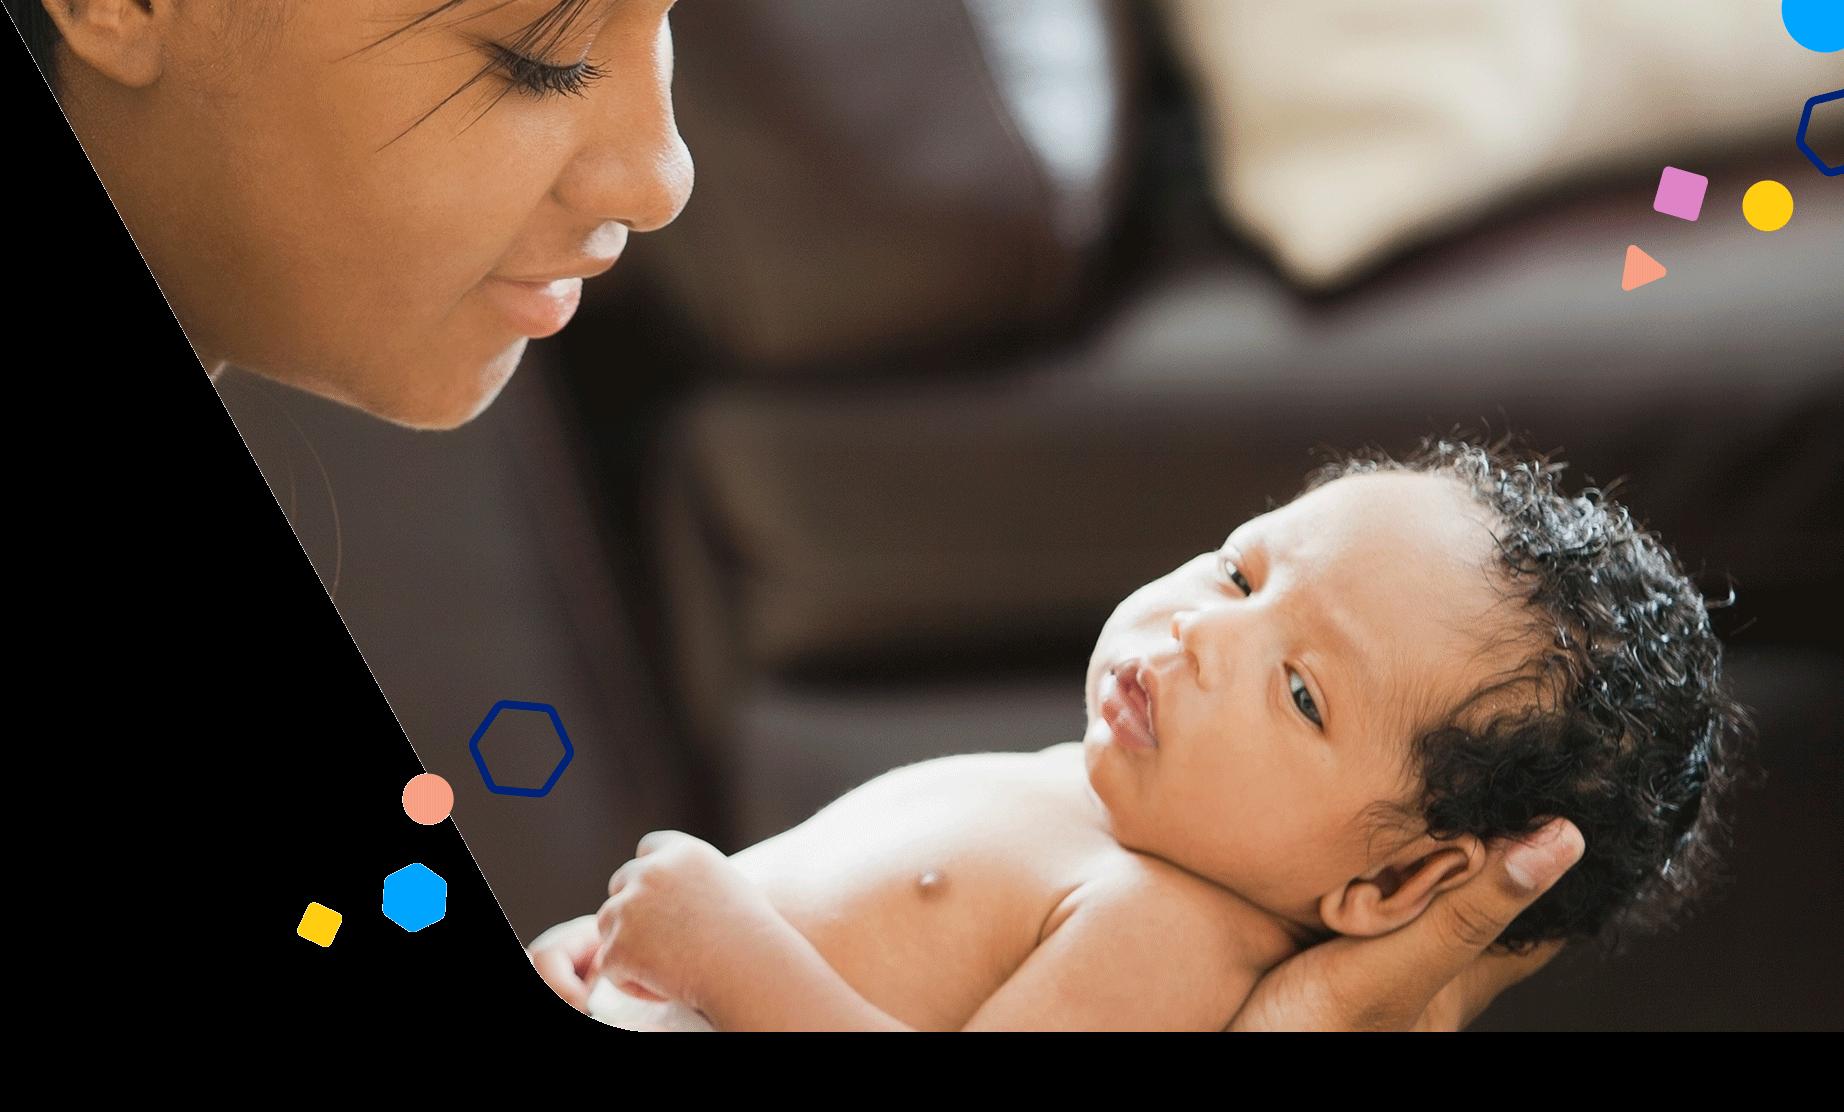 newborn-gas-questions-ask-your-pediatrician